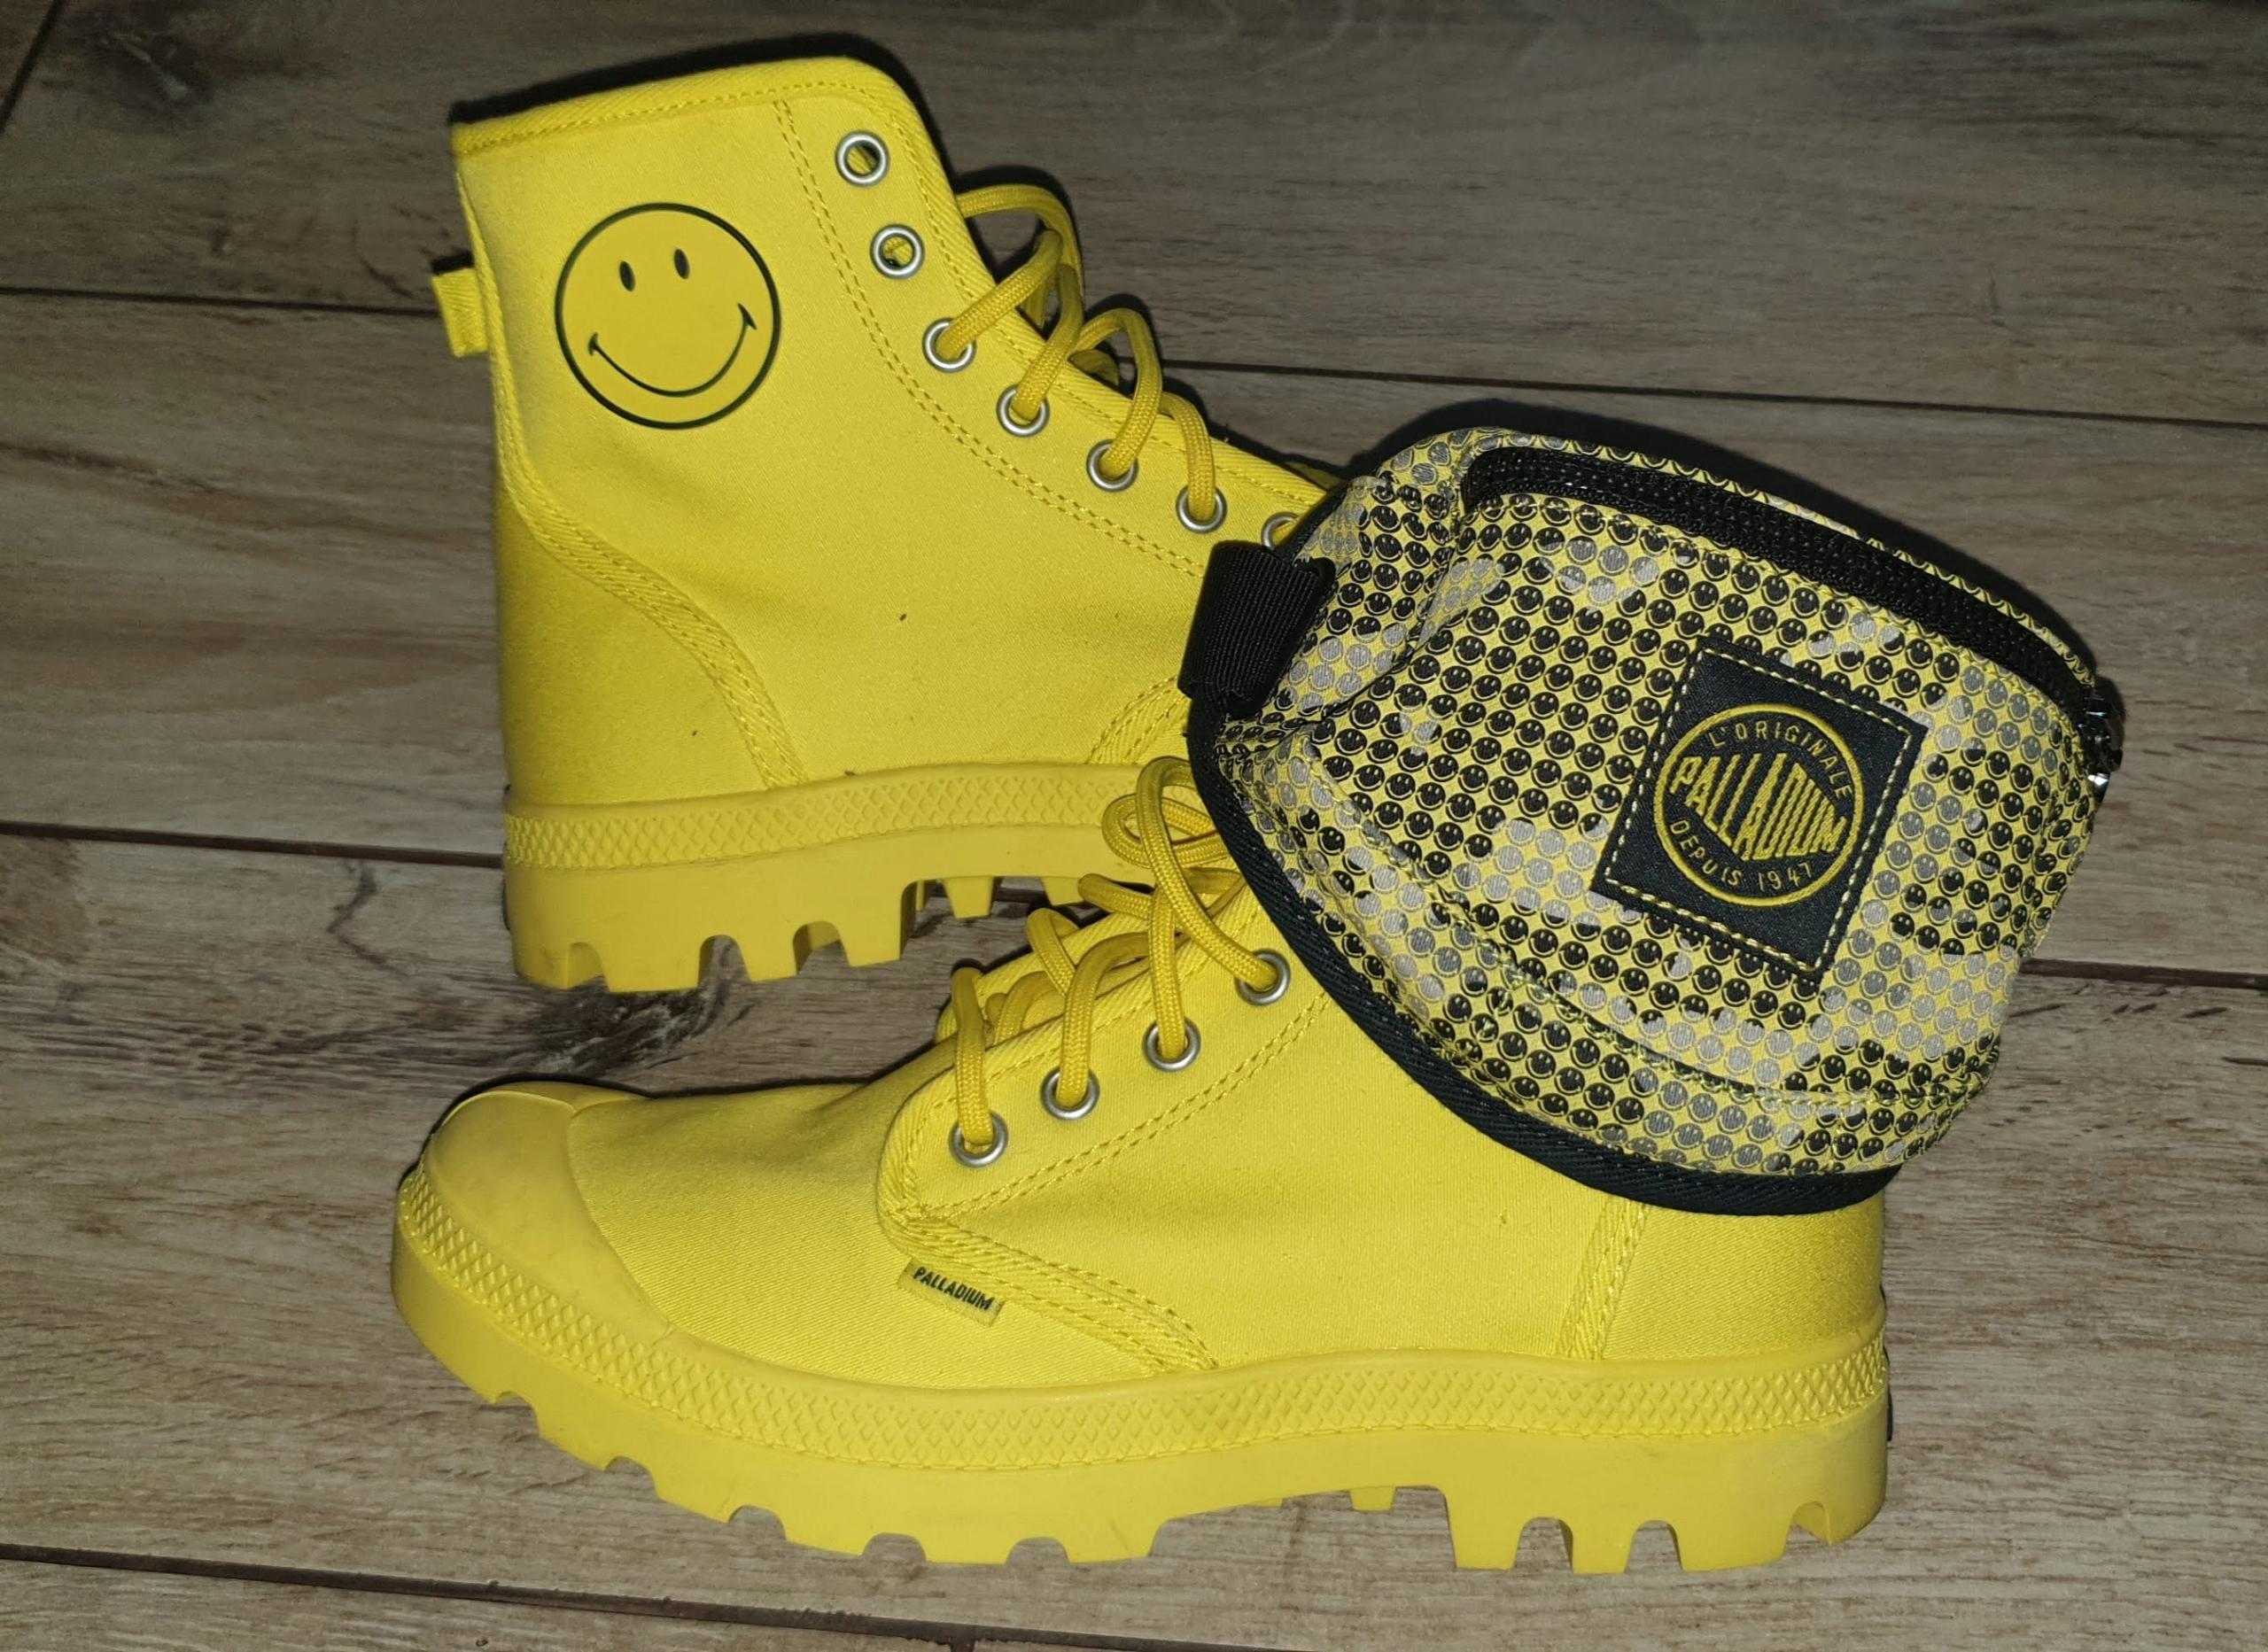 Palladium nowe smile roz. 38 saszetka buty trampki